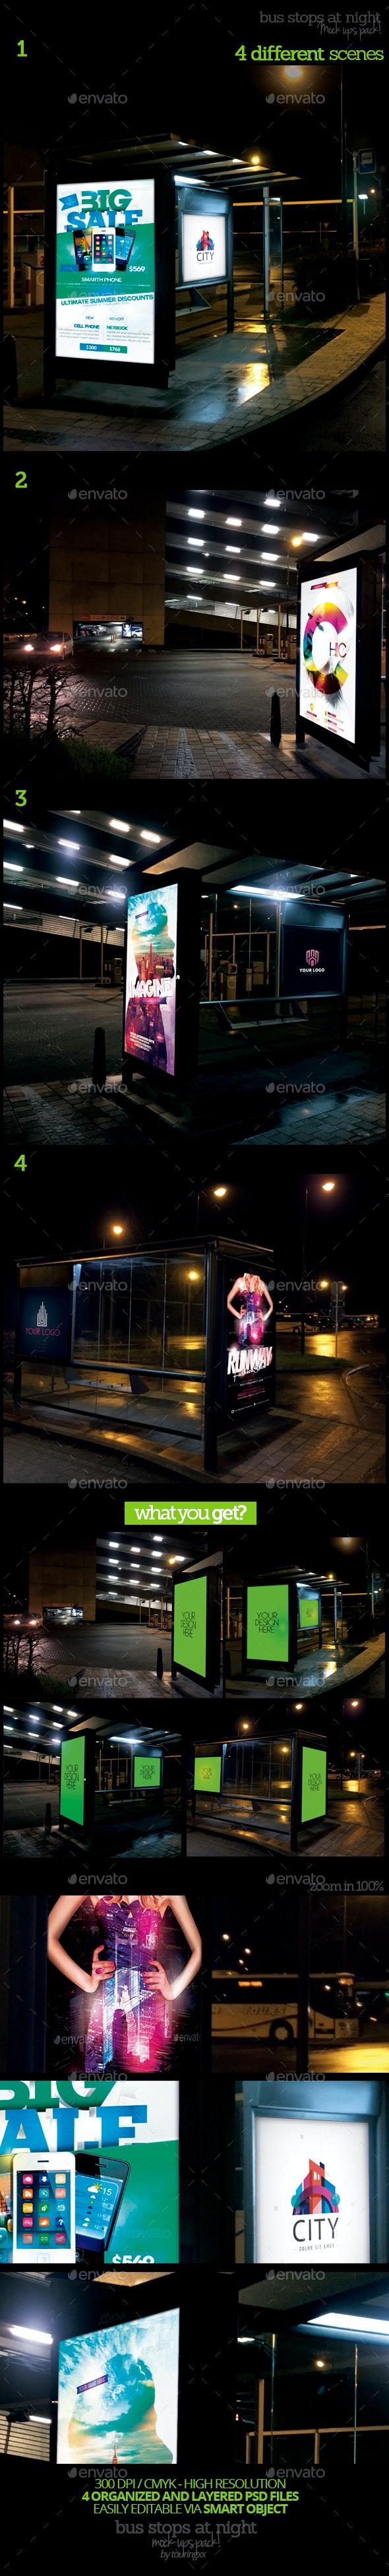 Bus Stops At Night Mock-Ups Pack - Product Mock-Ups Graphics